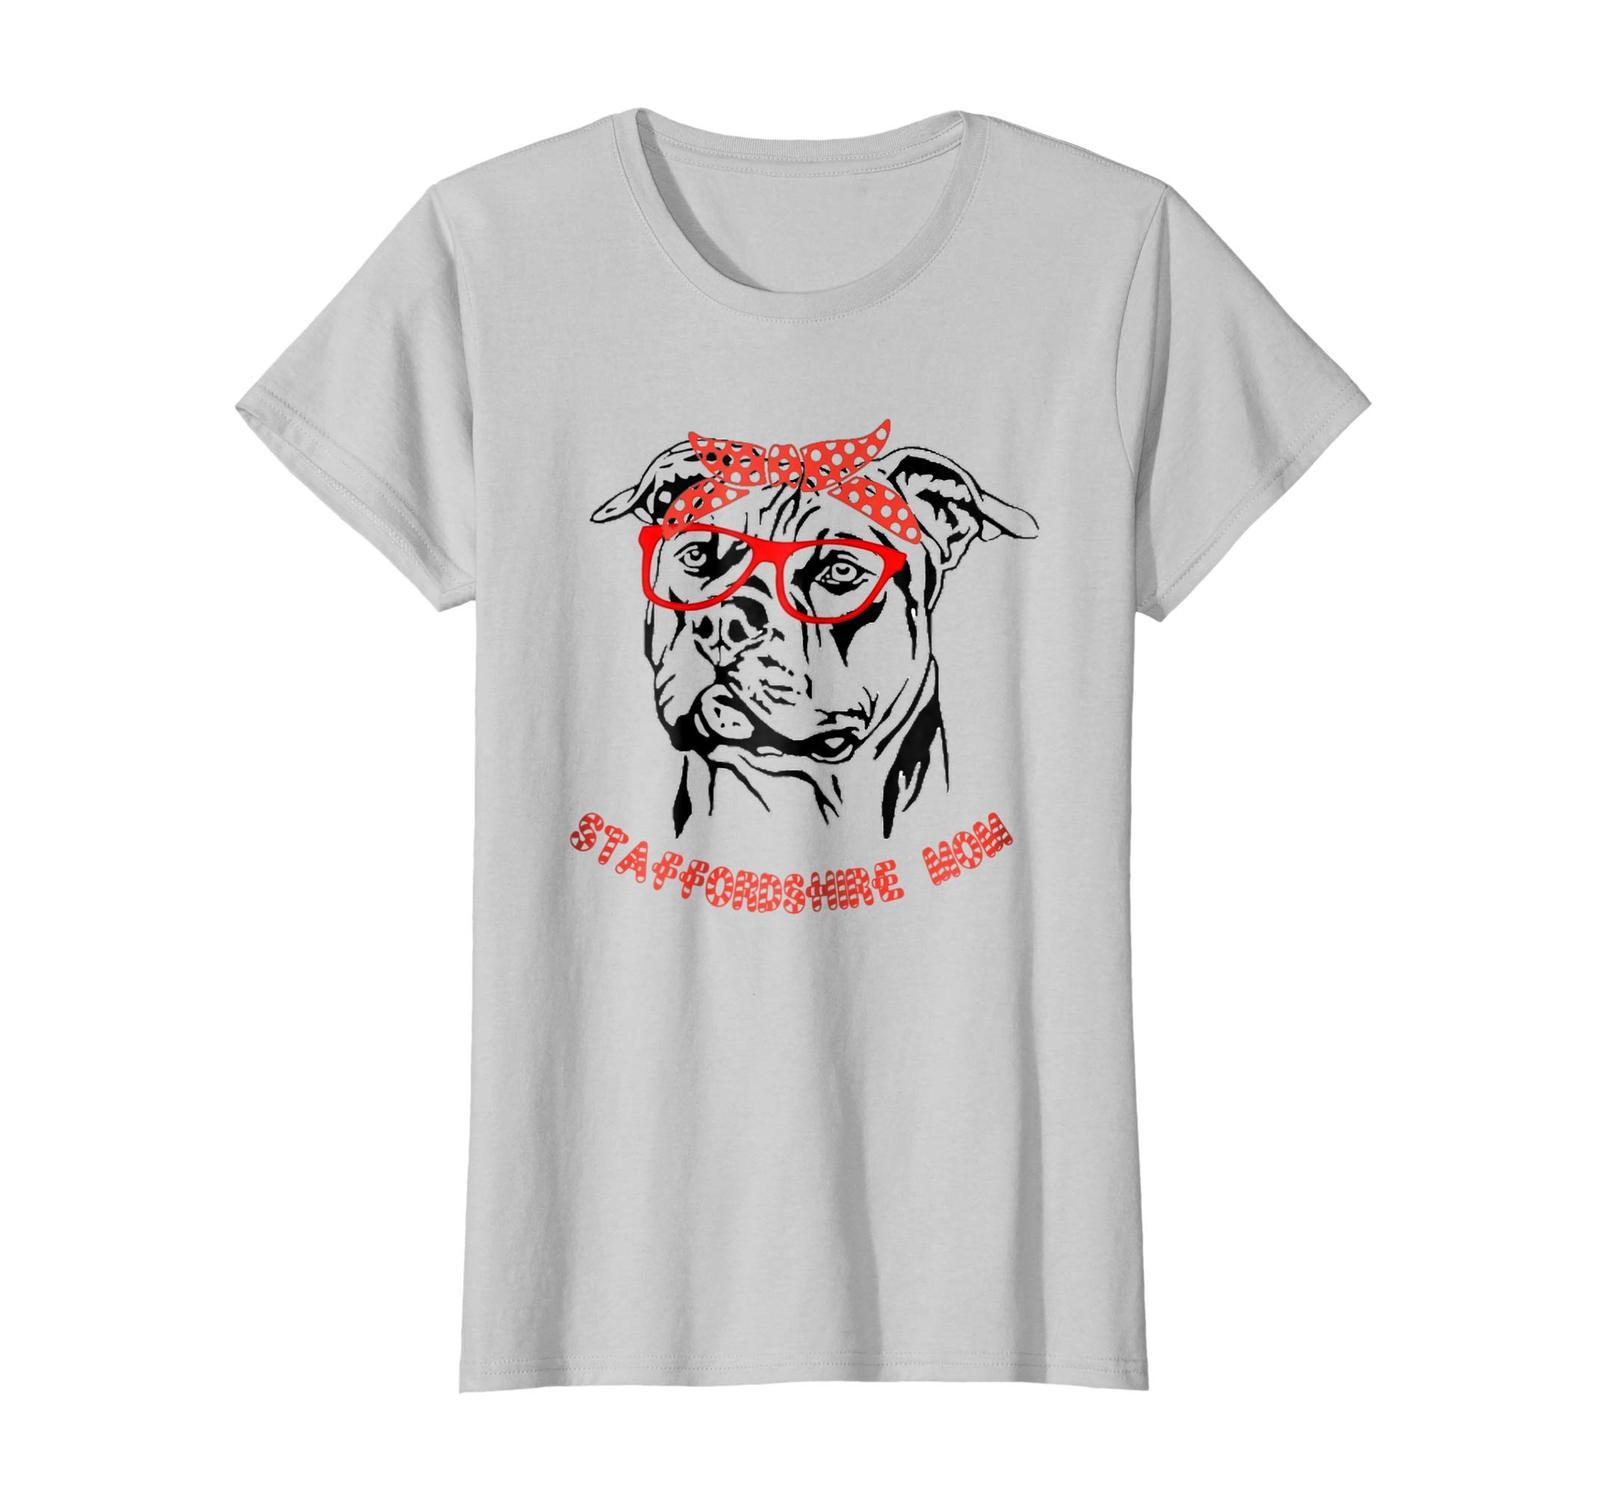 Dog Fashion - American Staffordshire America Shirt - Funny dog mom shirt Wowen